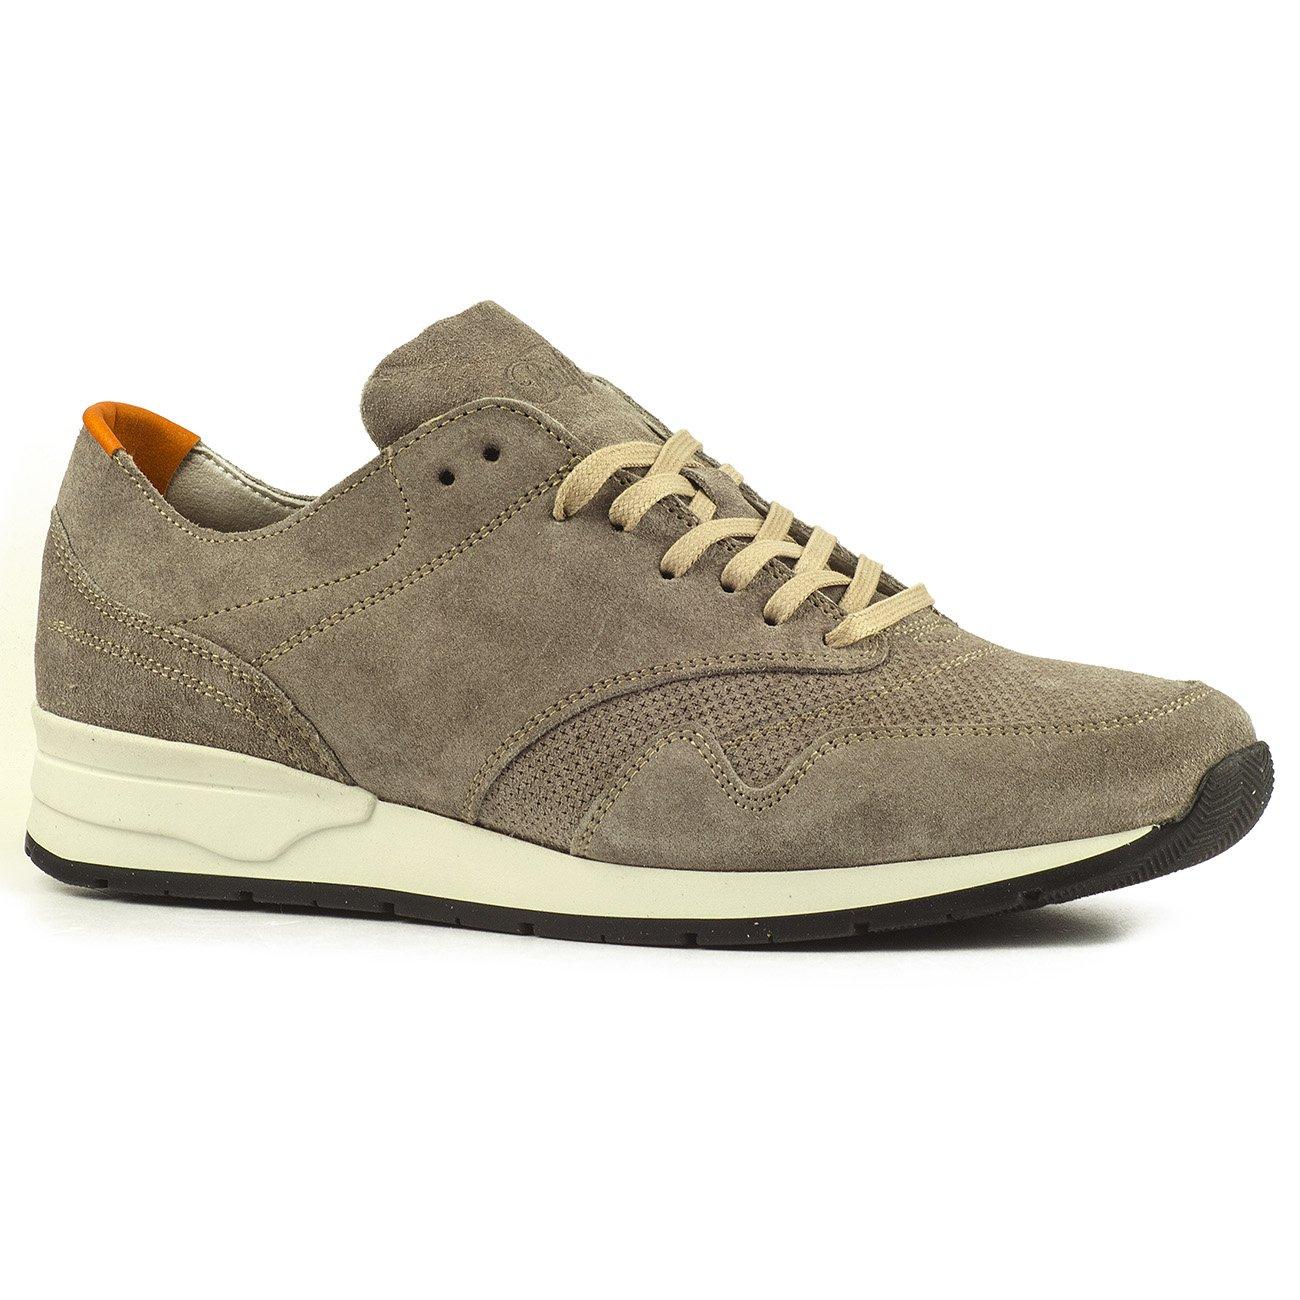 Buffalo Herren ES 30903 Schuhe Sneakers Turnschuhe Leder Suede Perforiert  43 EU|Grau 01